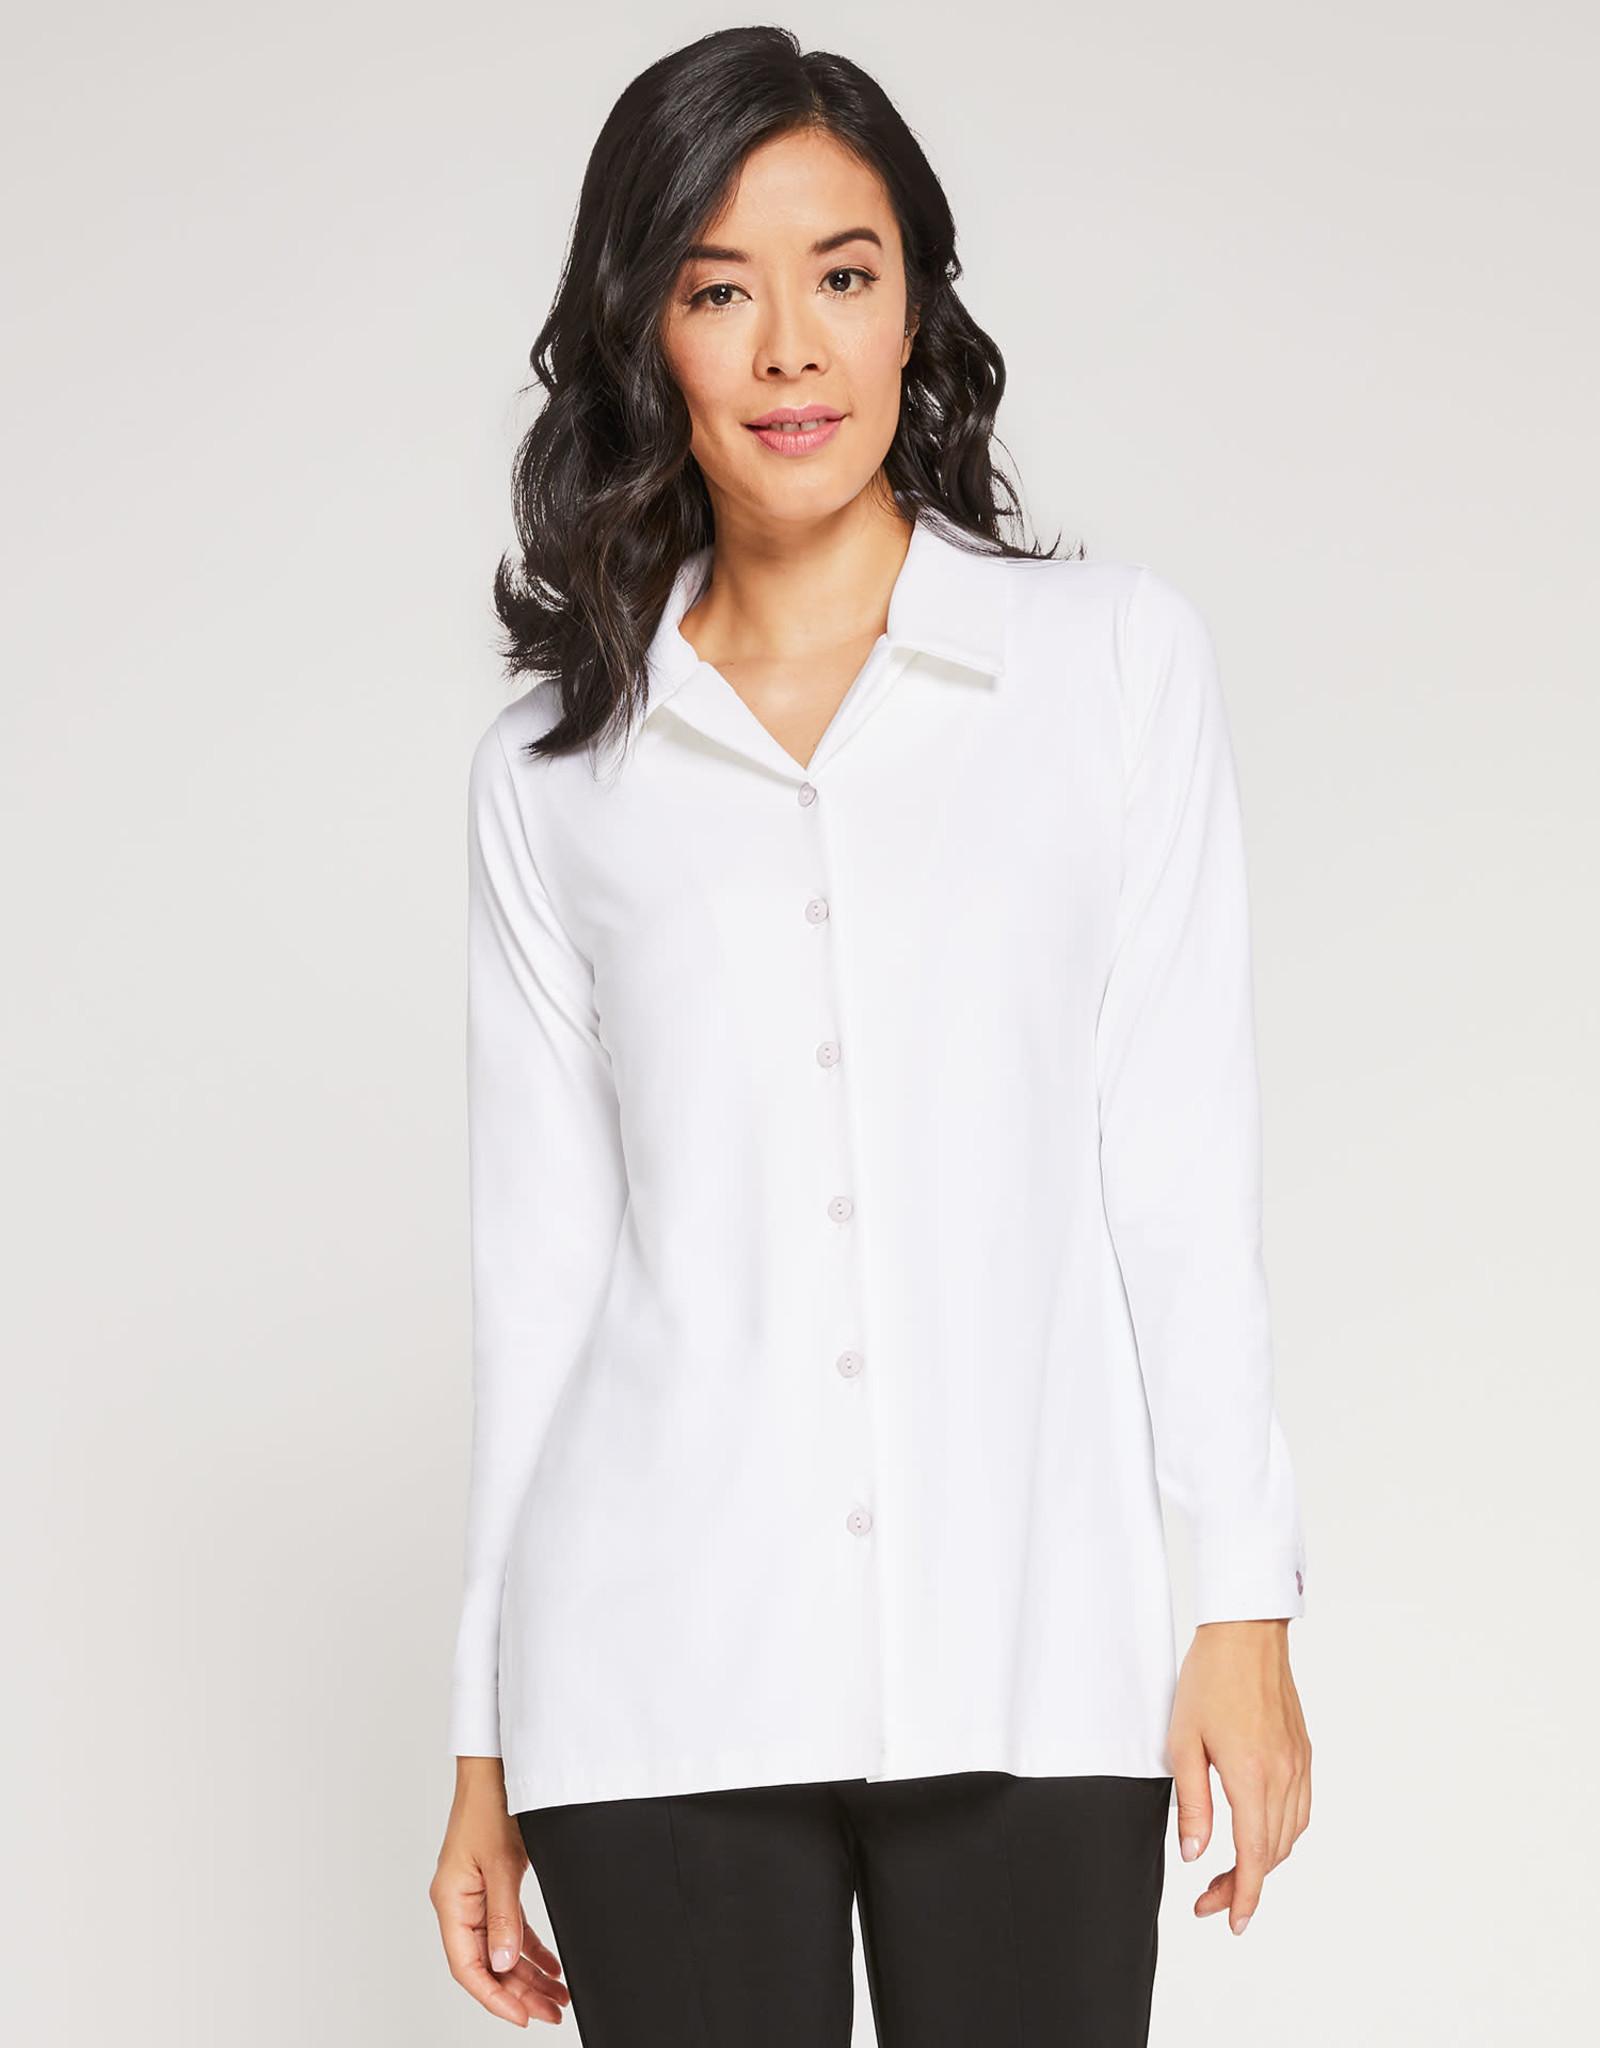 Sympli Long Sleeve Button Down Chic Shirt - White